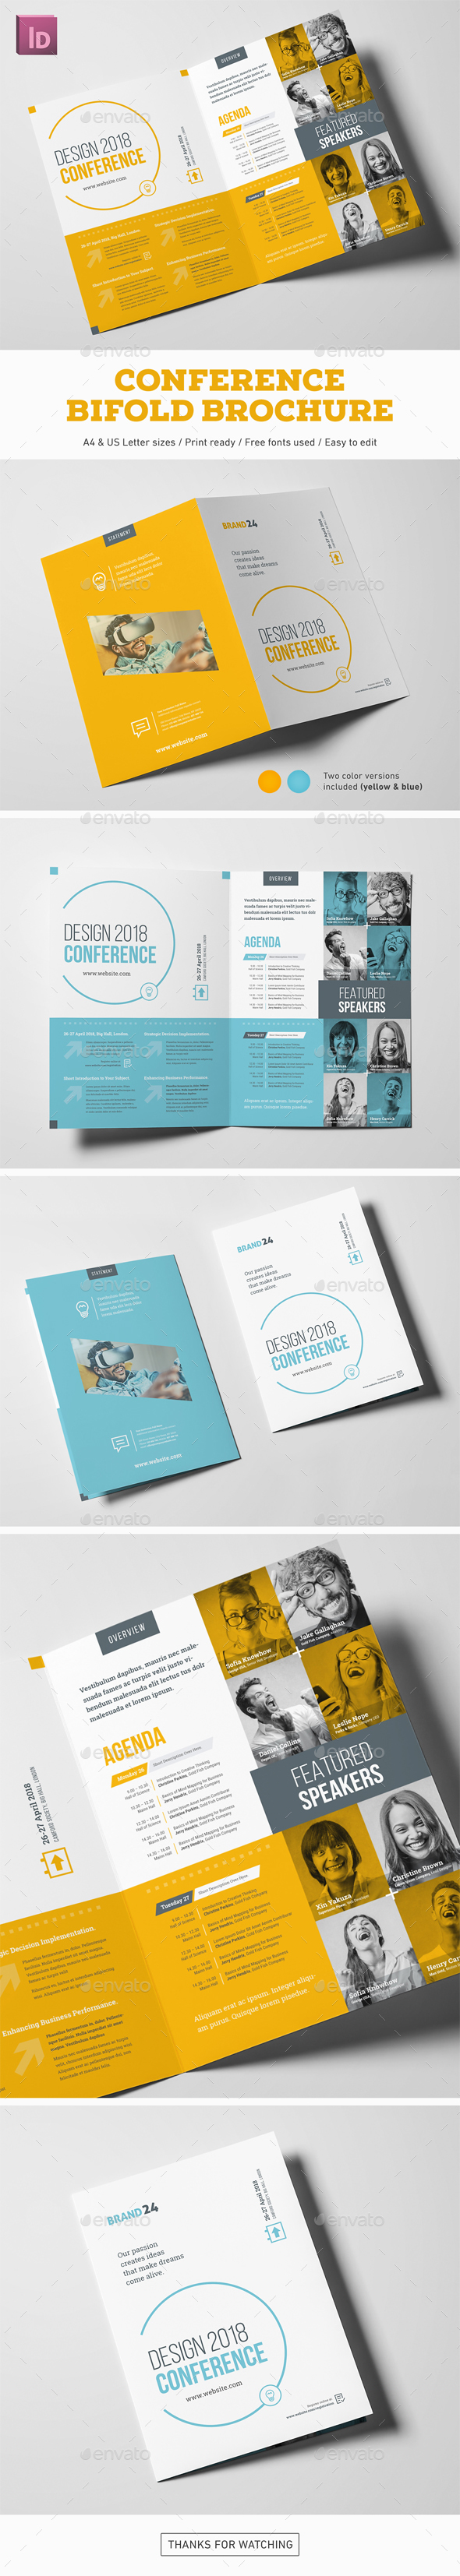 Conference Bifold Brochure - Corporate Brochures